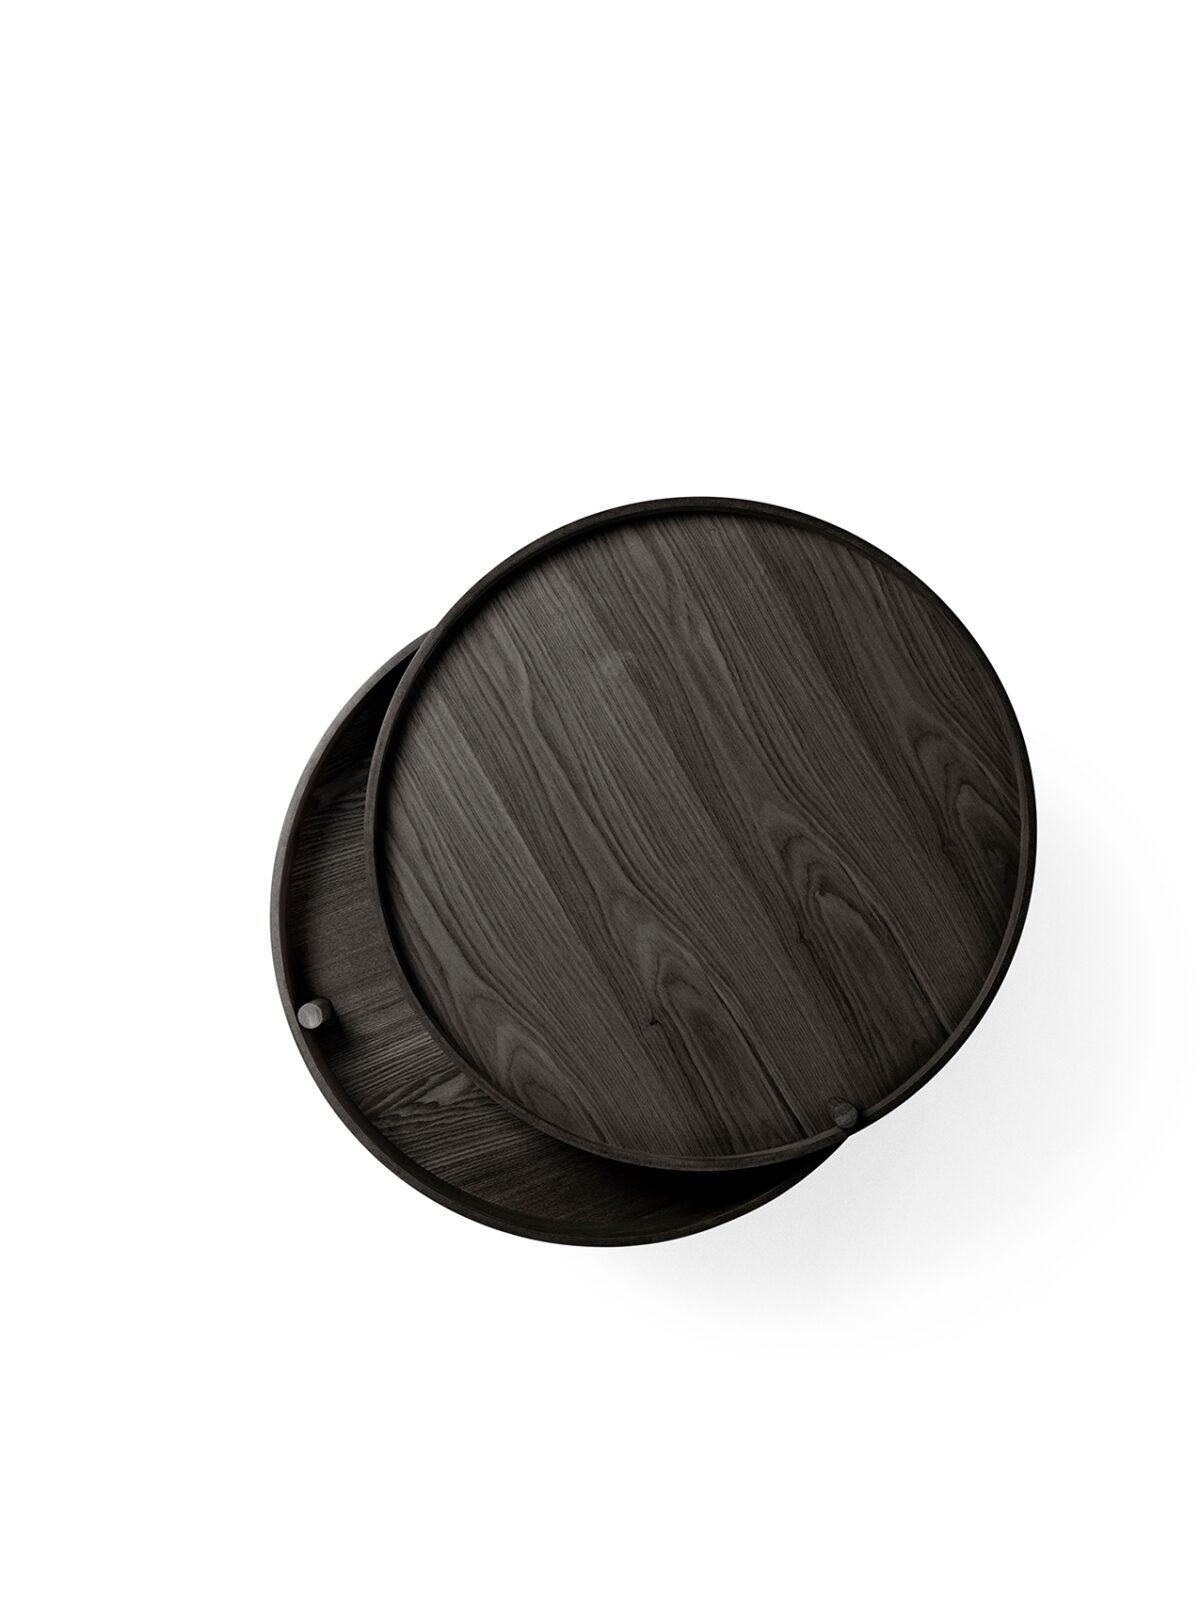 6900539 Turning Table Black2019 06 25 14 54 48 519 1